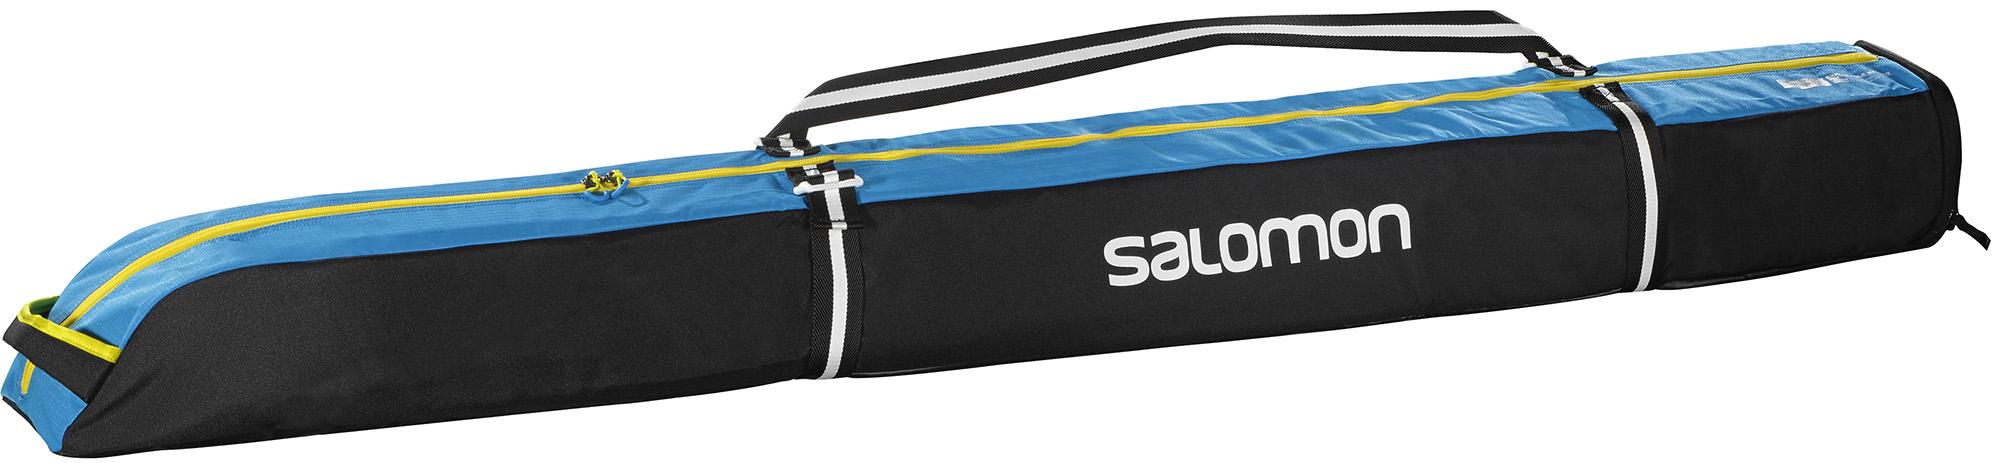 Salomon Чехол для горных лыж Salomon Extend 1P, 165+20 см